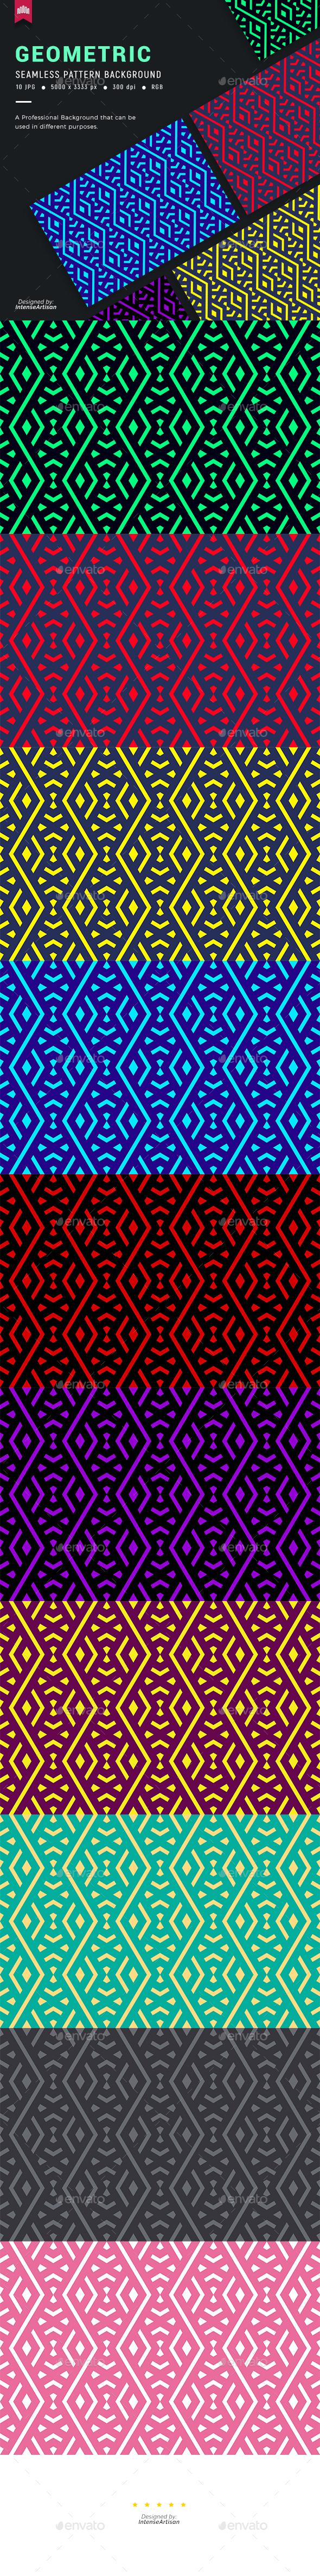 Geometric Seamless Pattern Background - Patterns Backgrounds